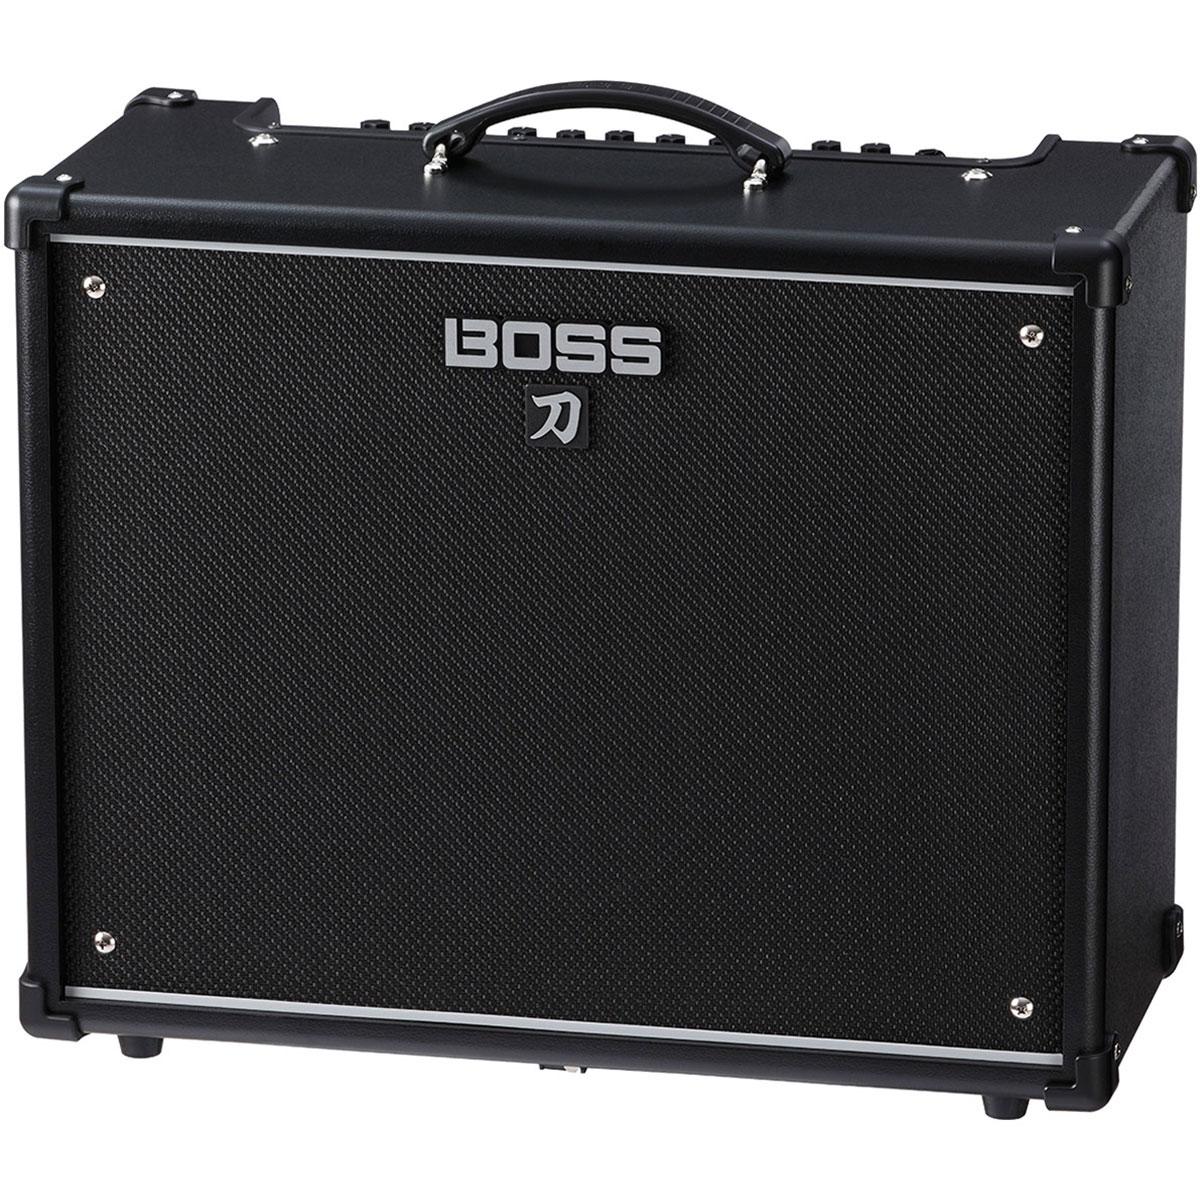 Boss - KTN100 Ampli Guitare Katana 100W